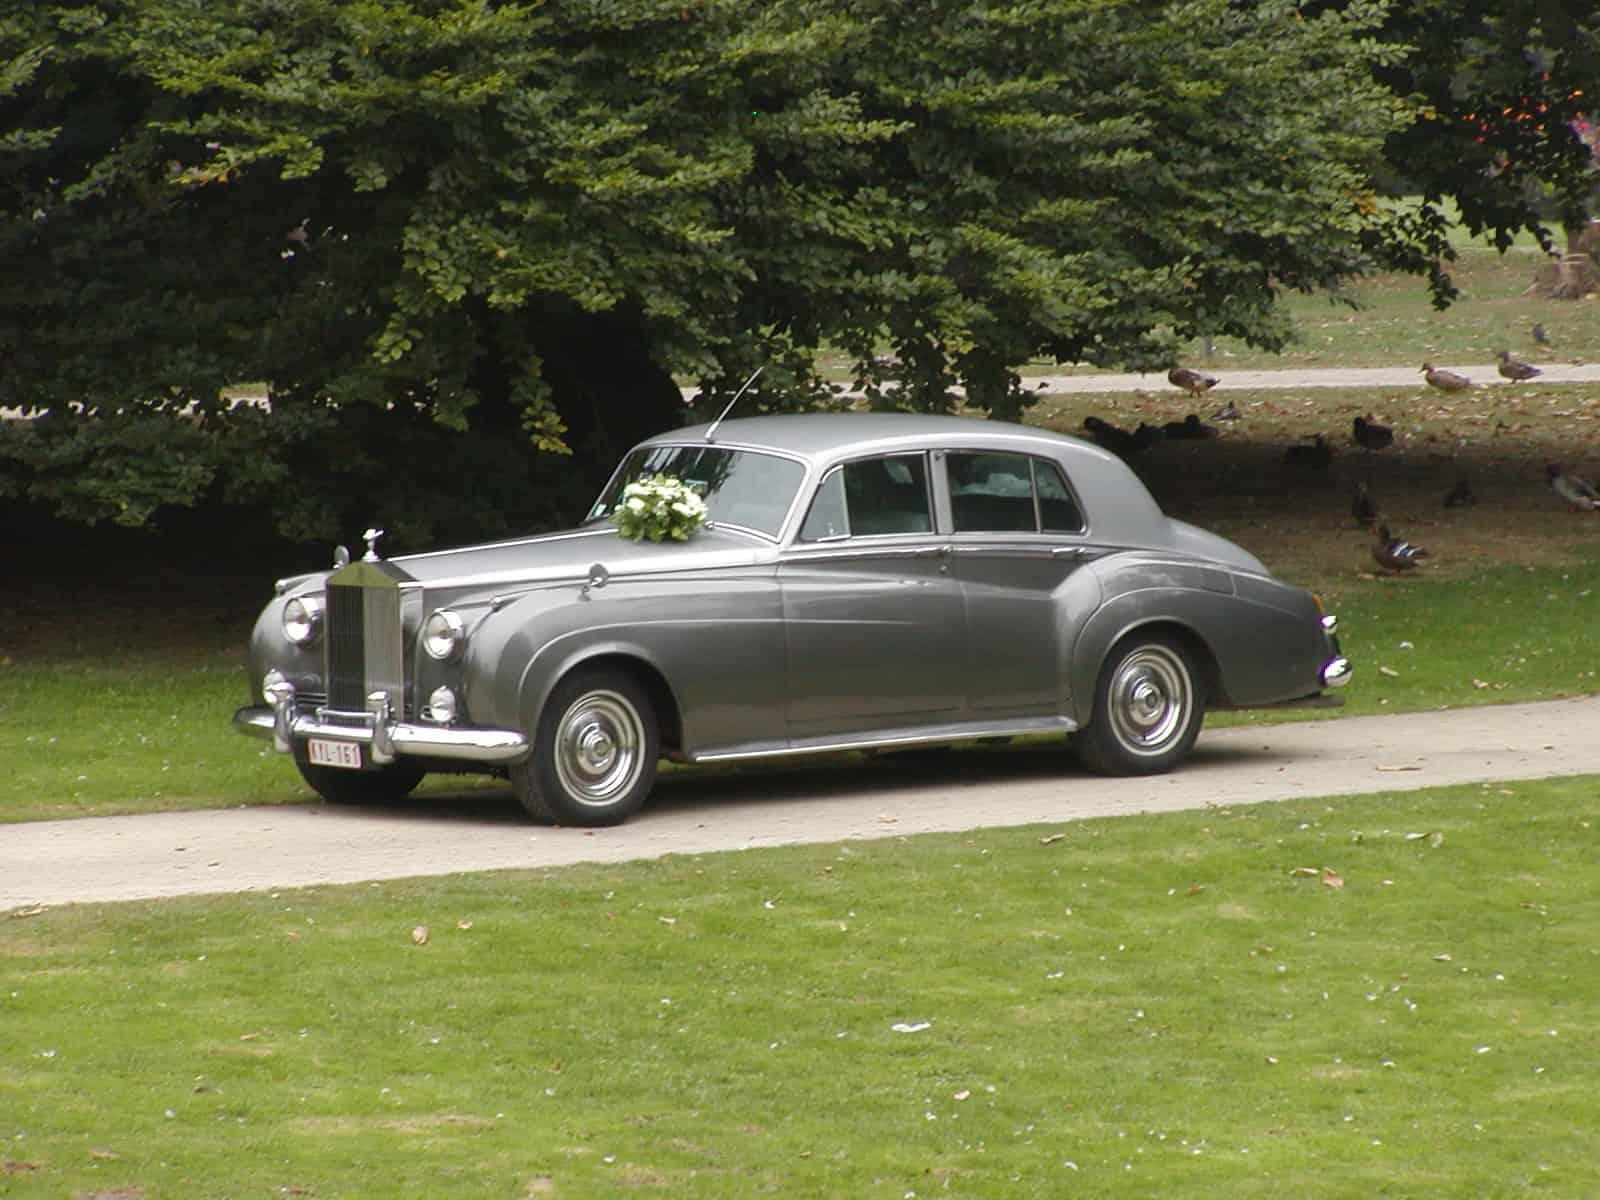 Rolls Royce Silver Cloud ceremonieauto